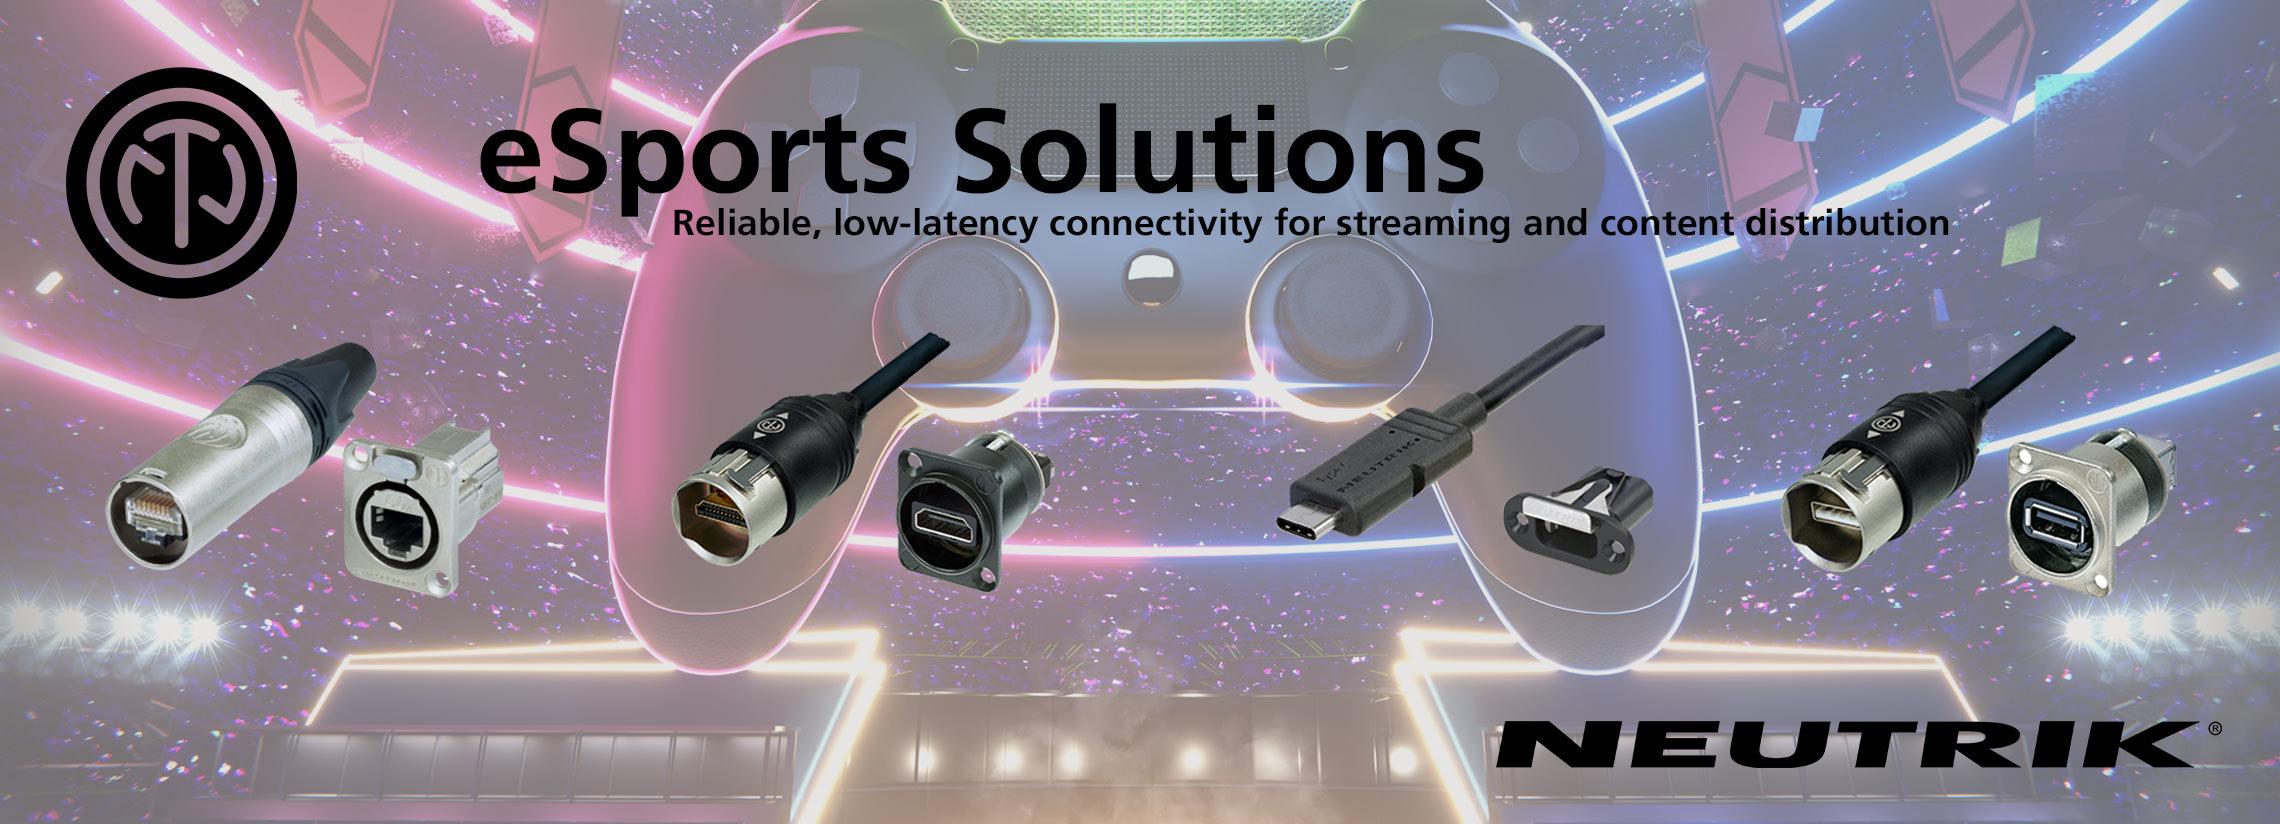 neutrik connectors for esports arenas